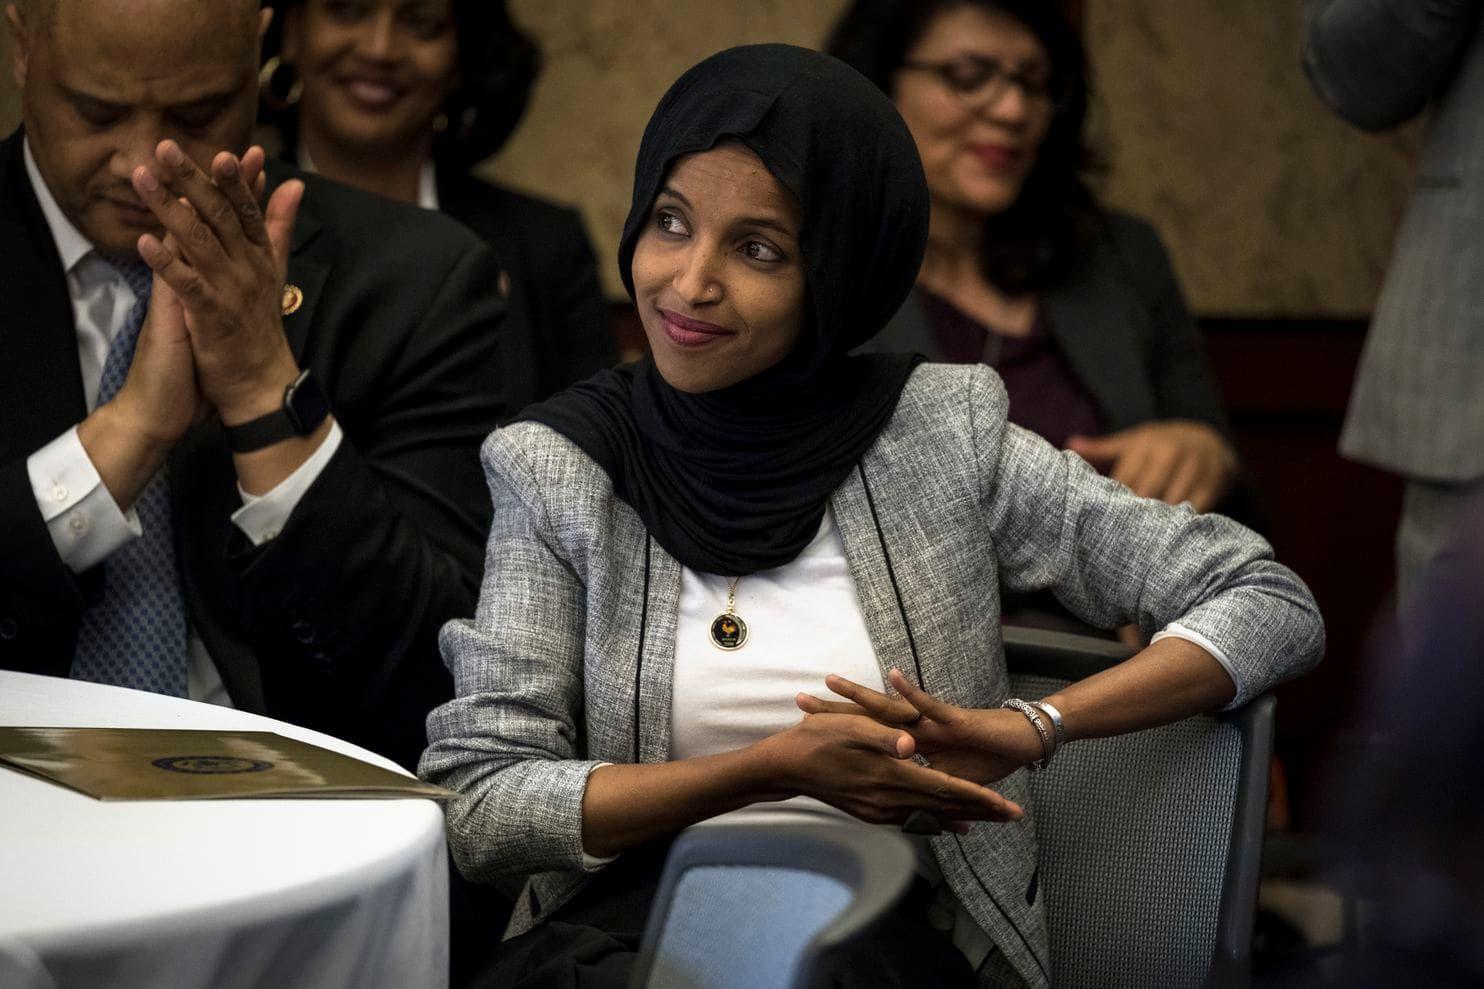 Photo Credit: Washington Post